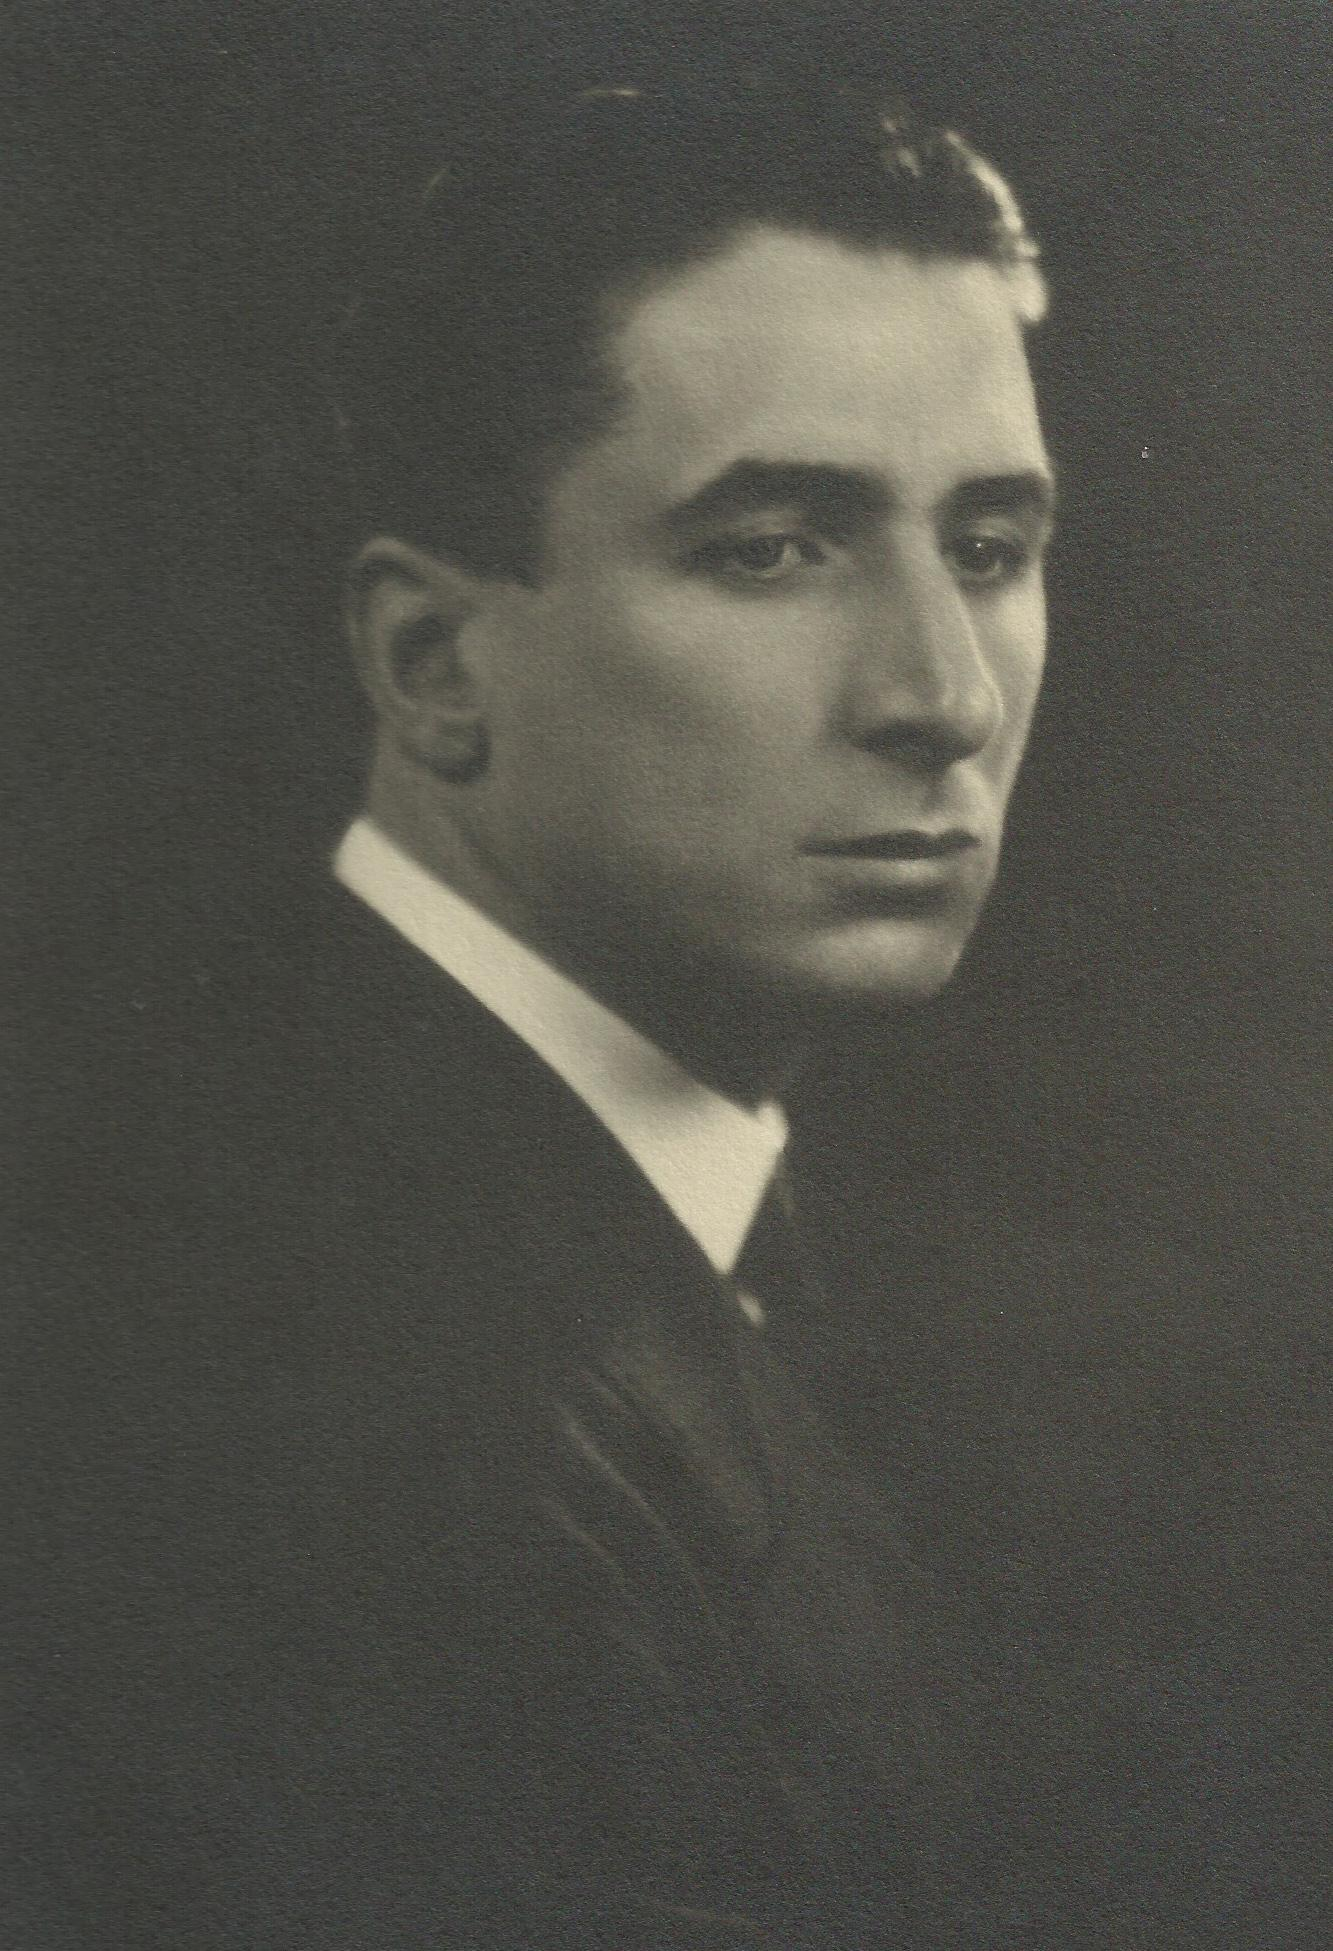 Amos Nattini - Wikipedia